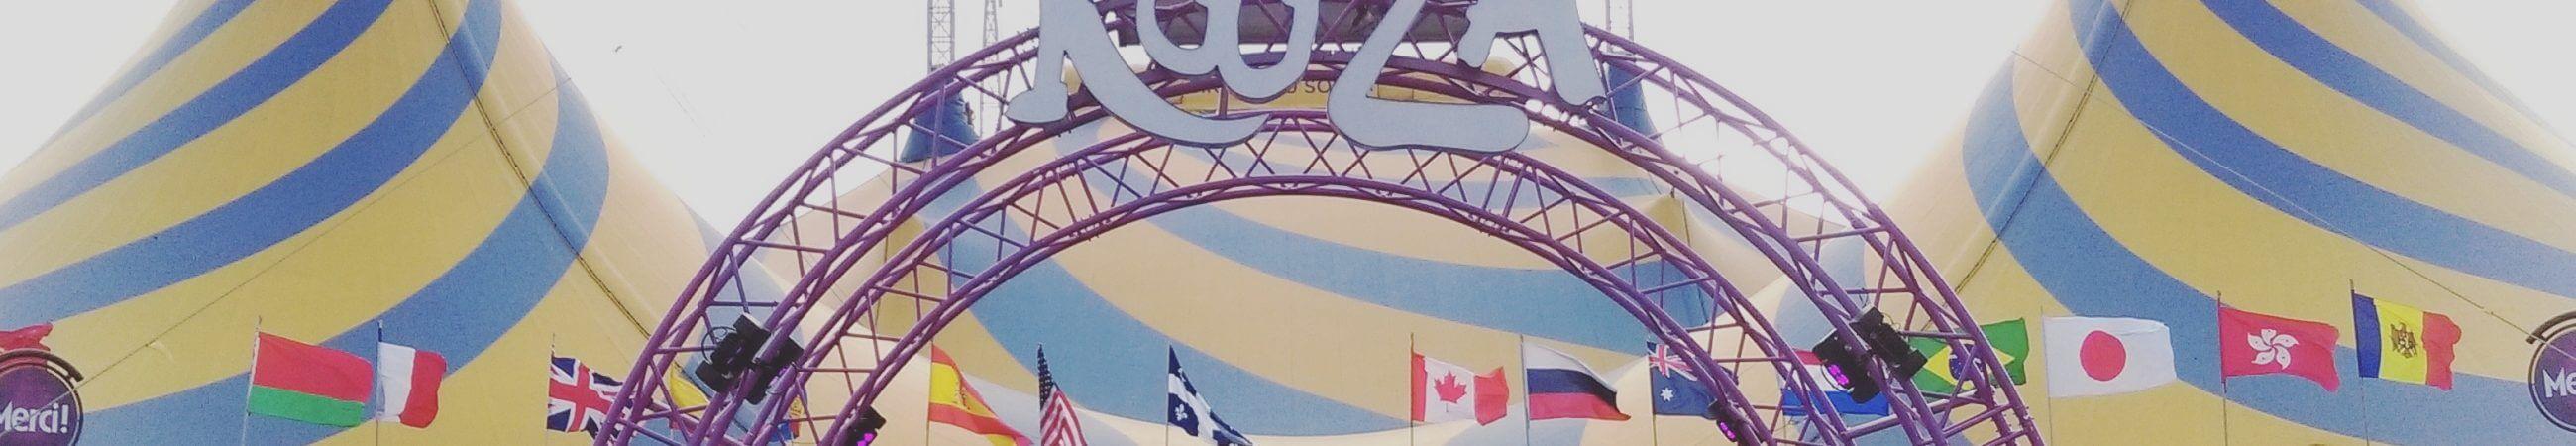 HOT: KOOZA By Cirque Du Soleil, Flemington Racecourse, Flemington